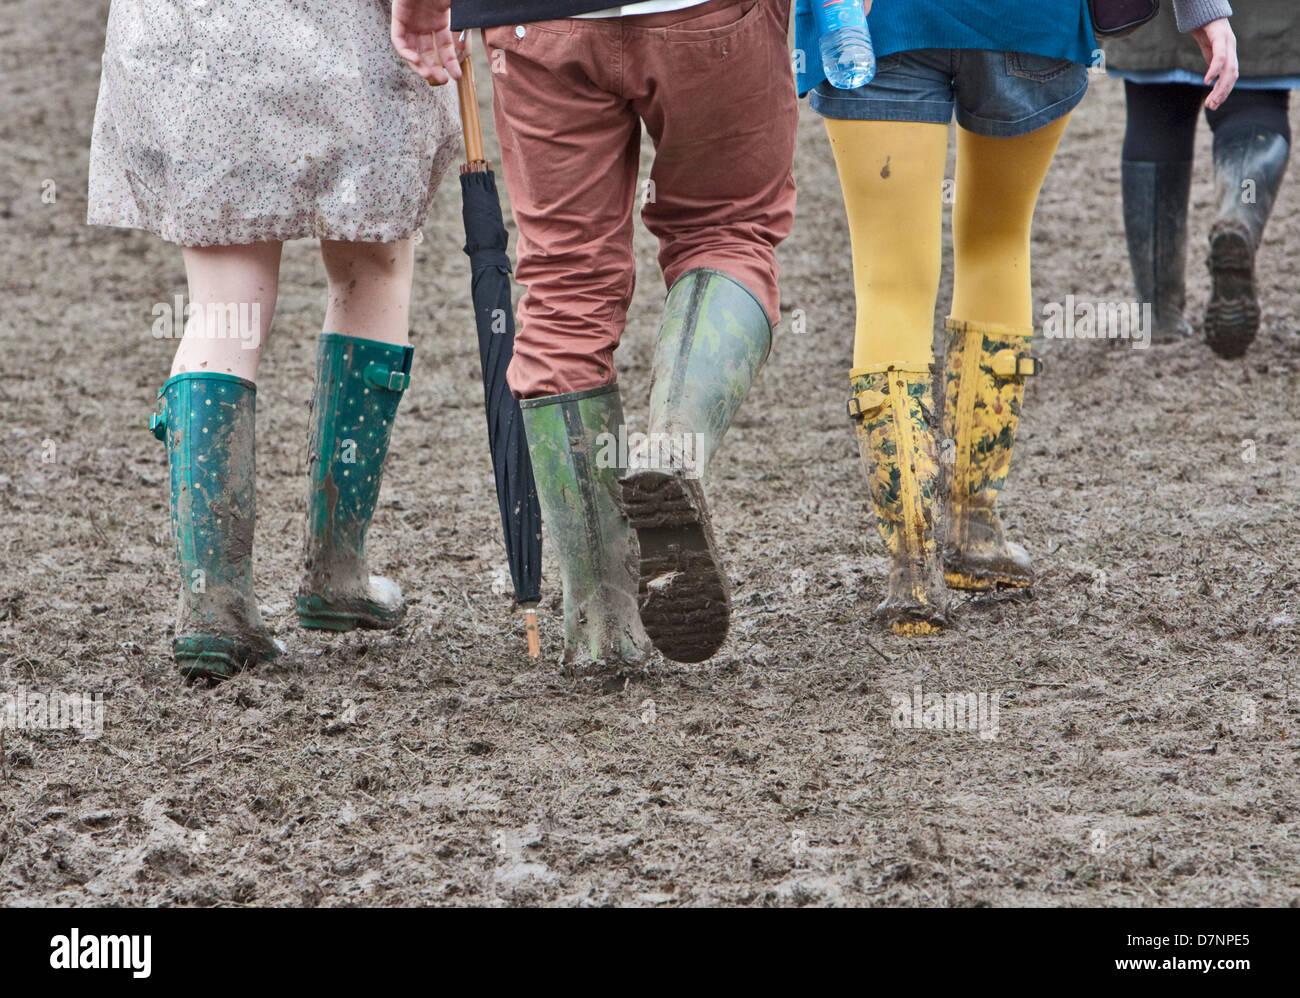 Handmade FESTIVAL WELLY /& CIDER NECKLACE mud MUDDY glastonbury THATCHERS wellies